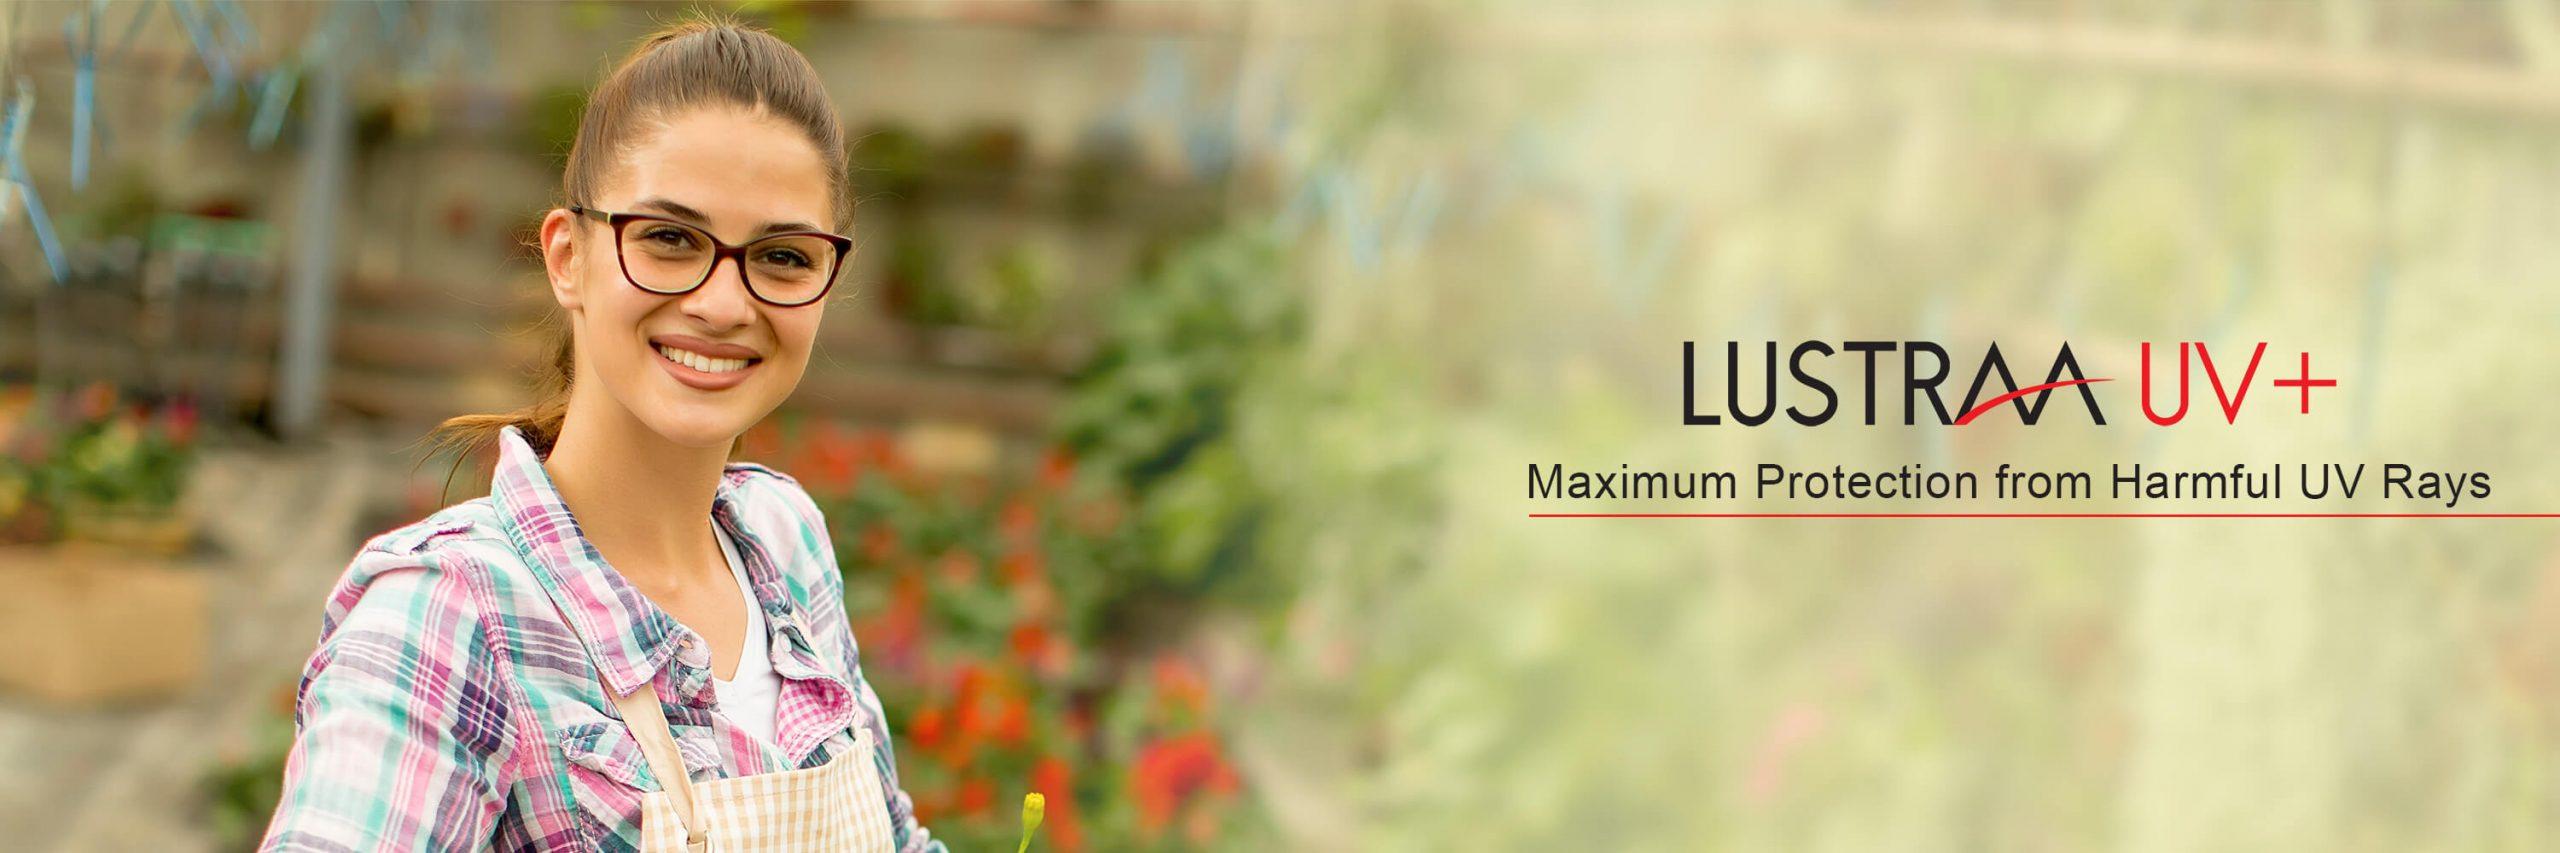 LUSTRAA UV+ Maximum Protection from Harmful UV Rays